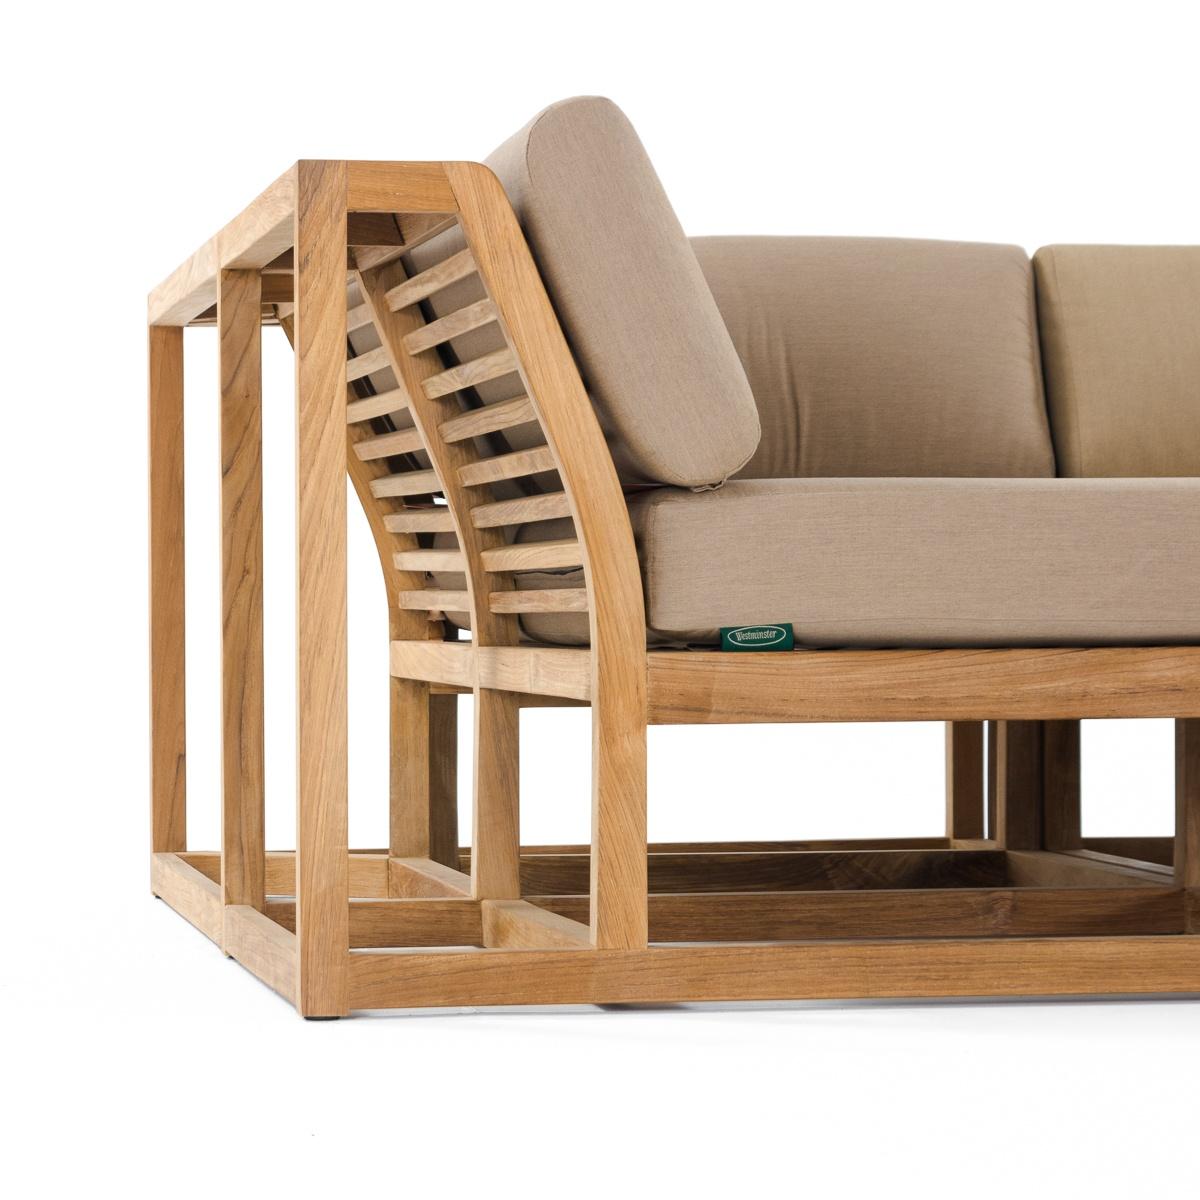 Maya Collection Teak Sectional Sofa Set Westminster Teak Outdoor Furniture